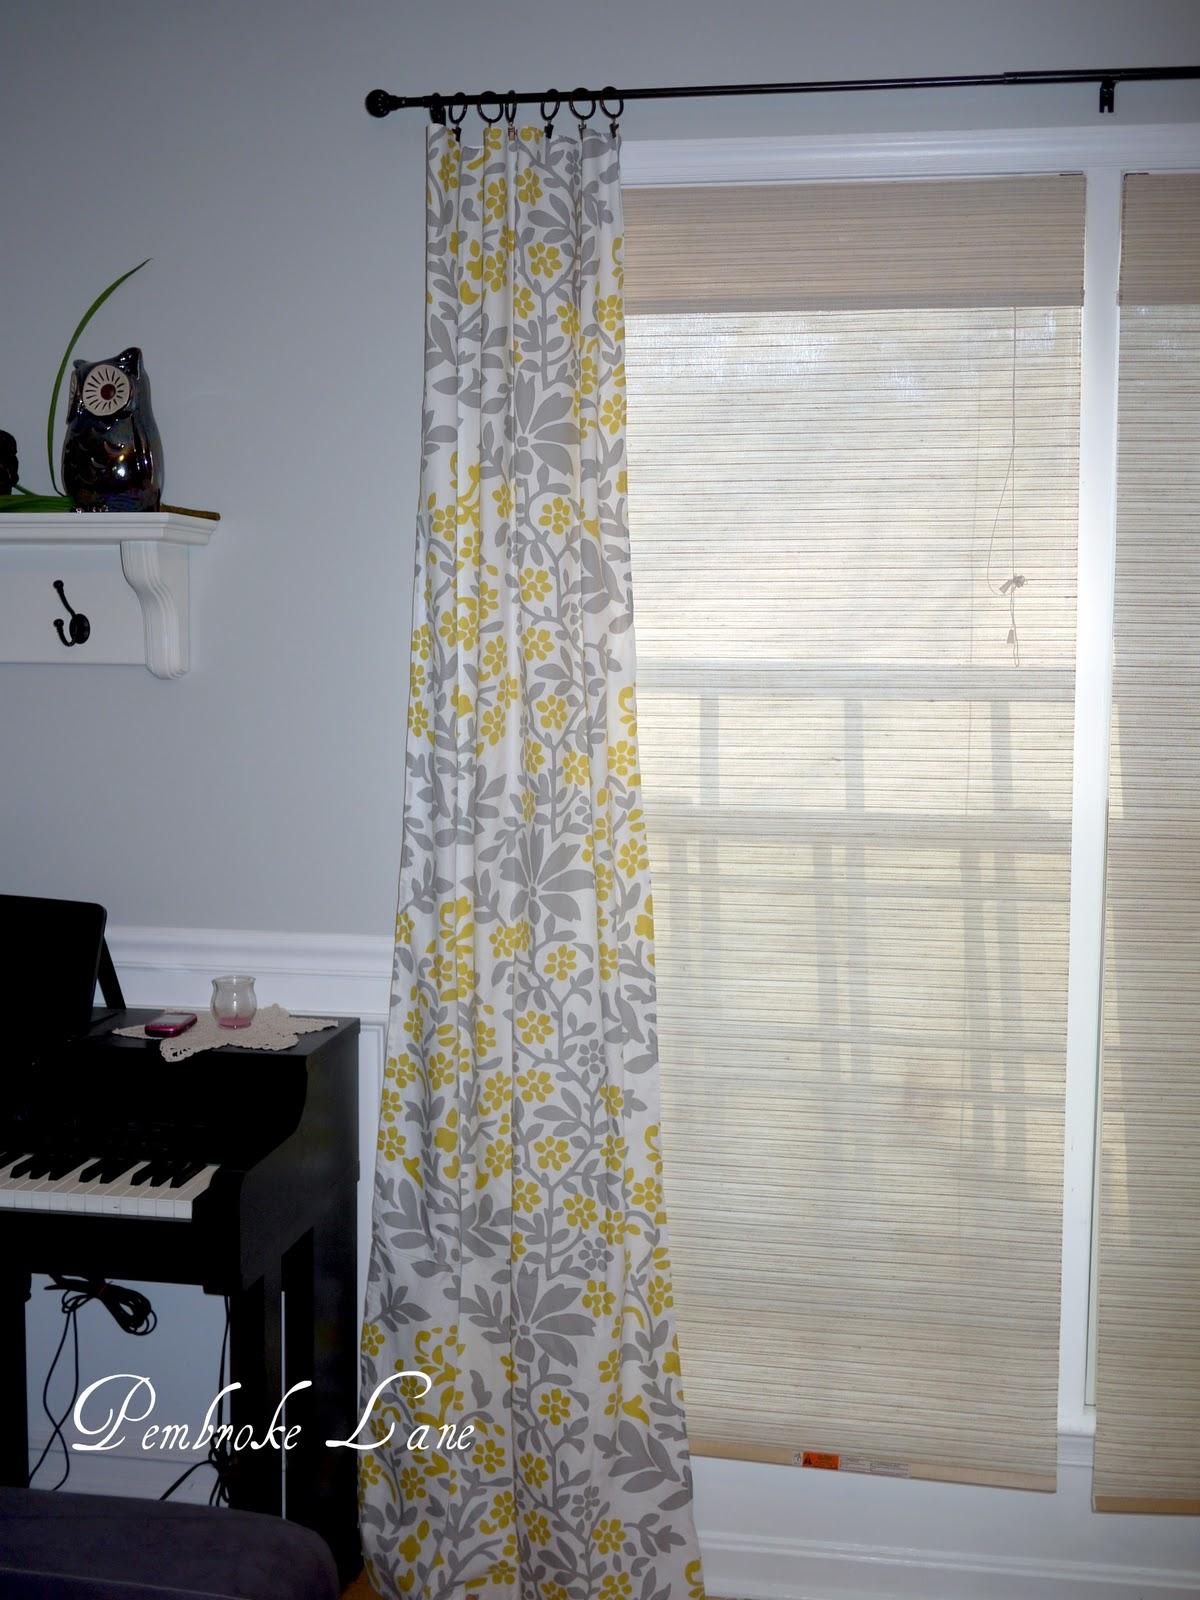 Pembroke Lane Pink And Yellow Ikea Klippan Dyed Couch